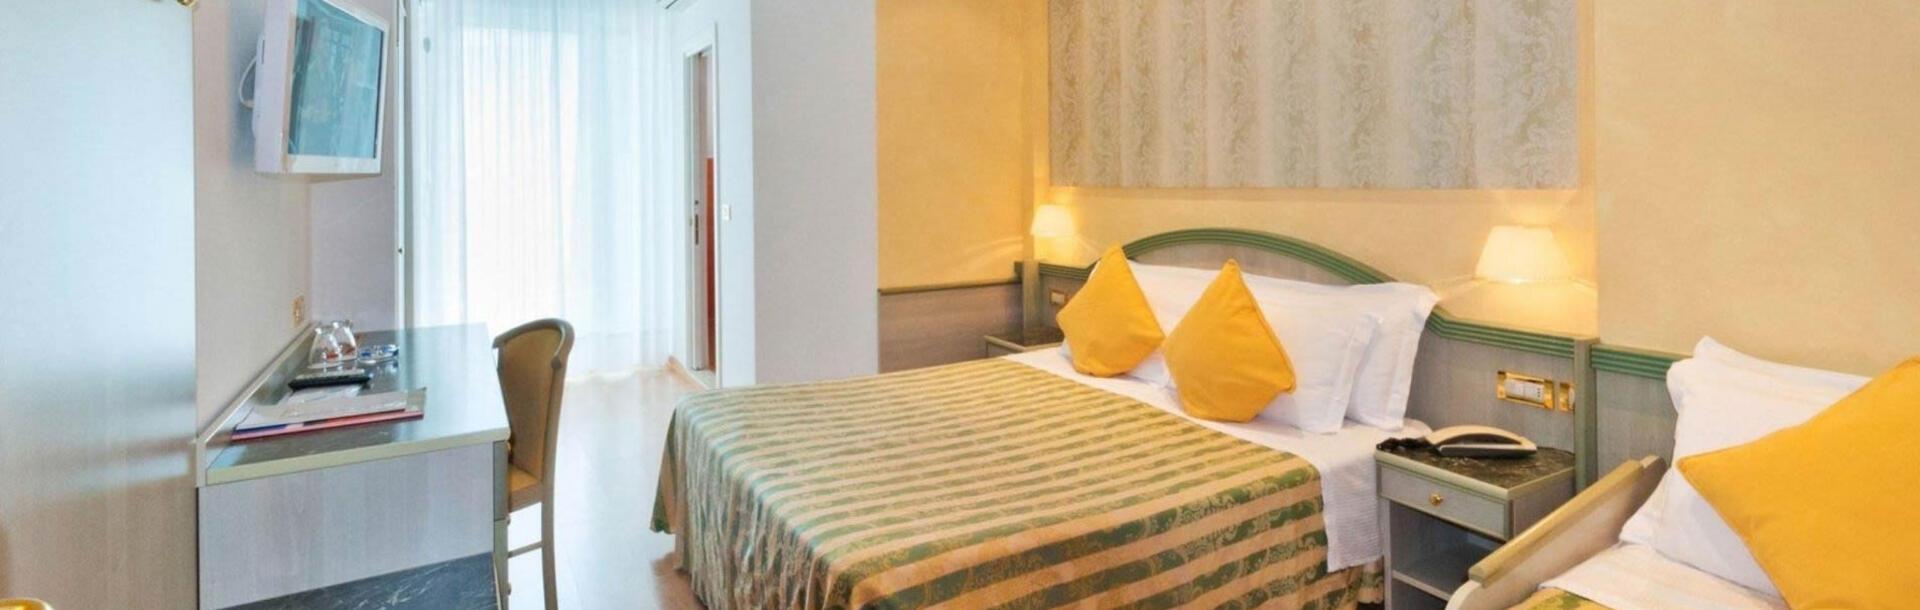 hotel-montecarlo pl pokoje-comfort 013